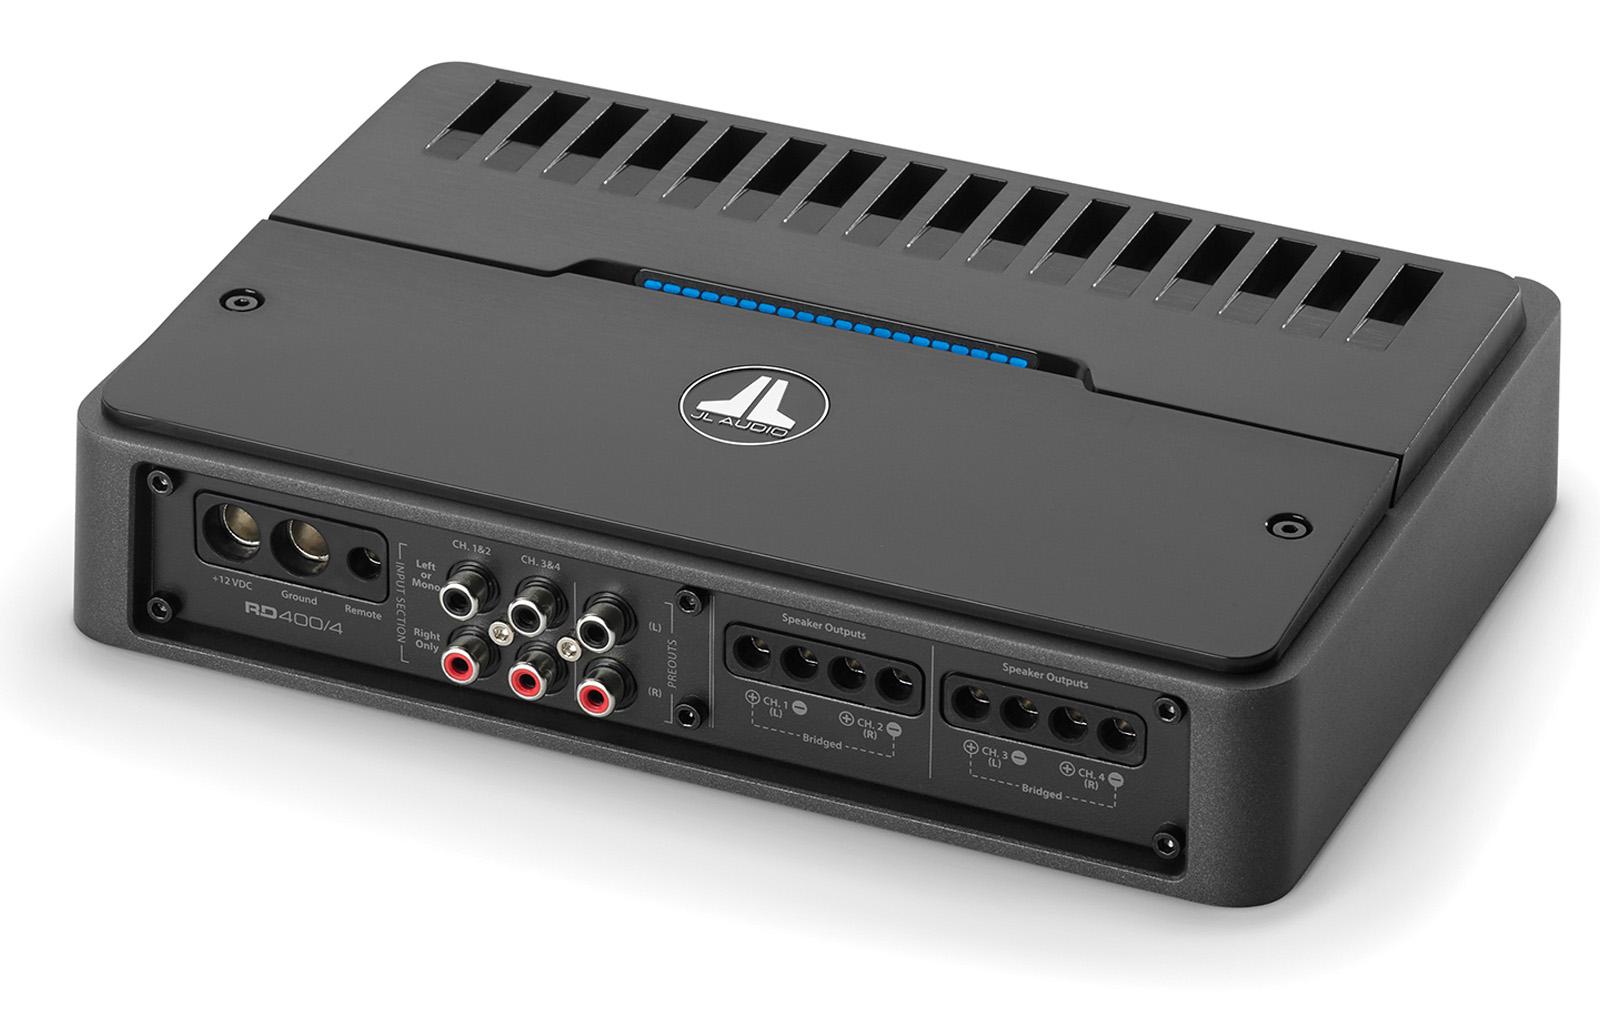 Pasmag performance auto and sound jl audio rd4004 amplifier review jl audio rd400 4 photo rd400 4 flt falaconquin